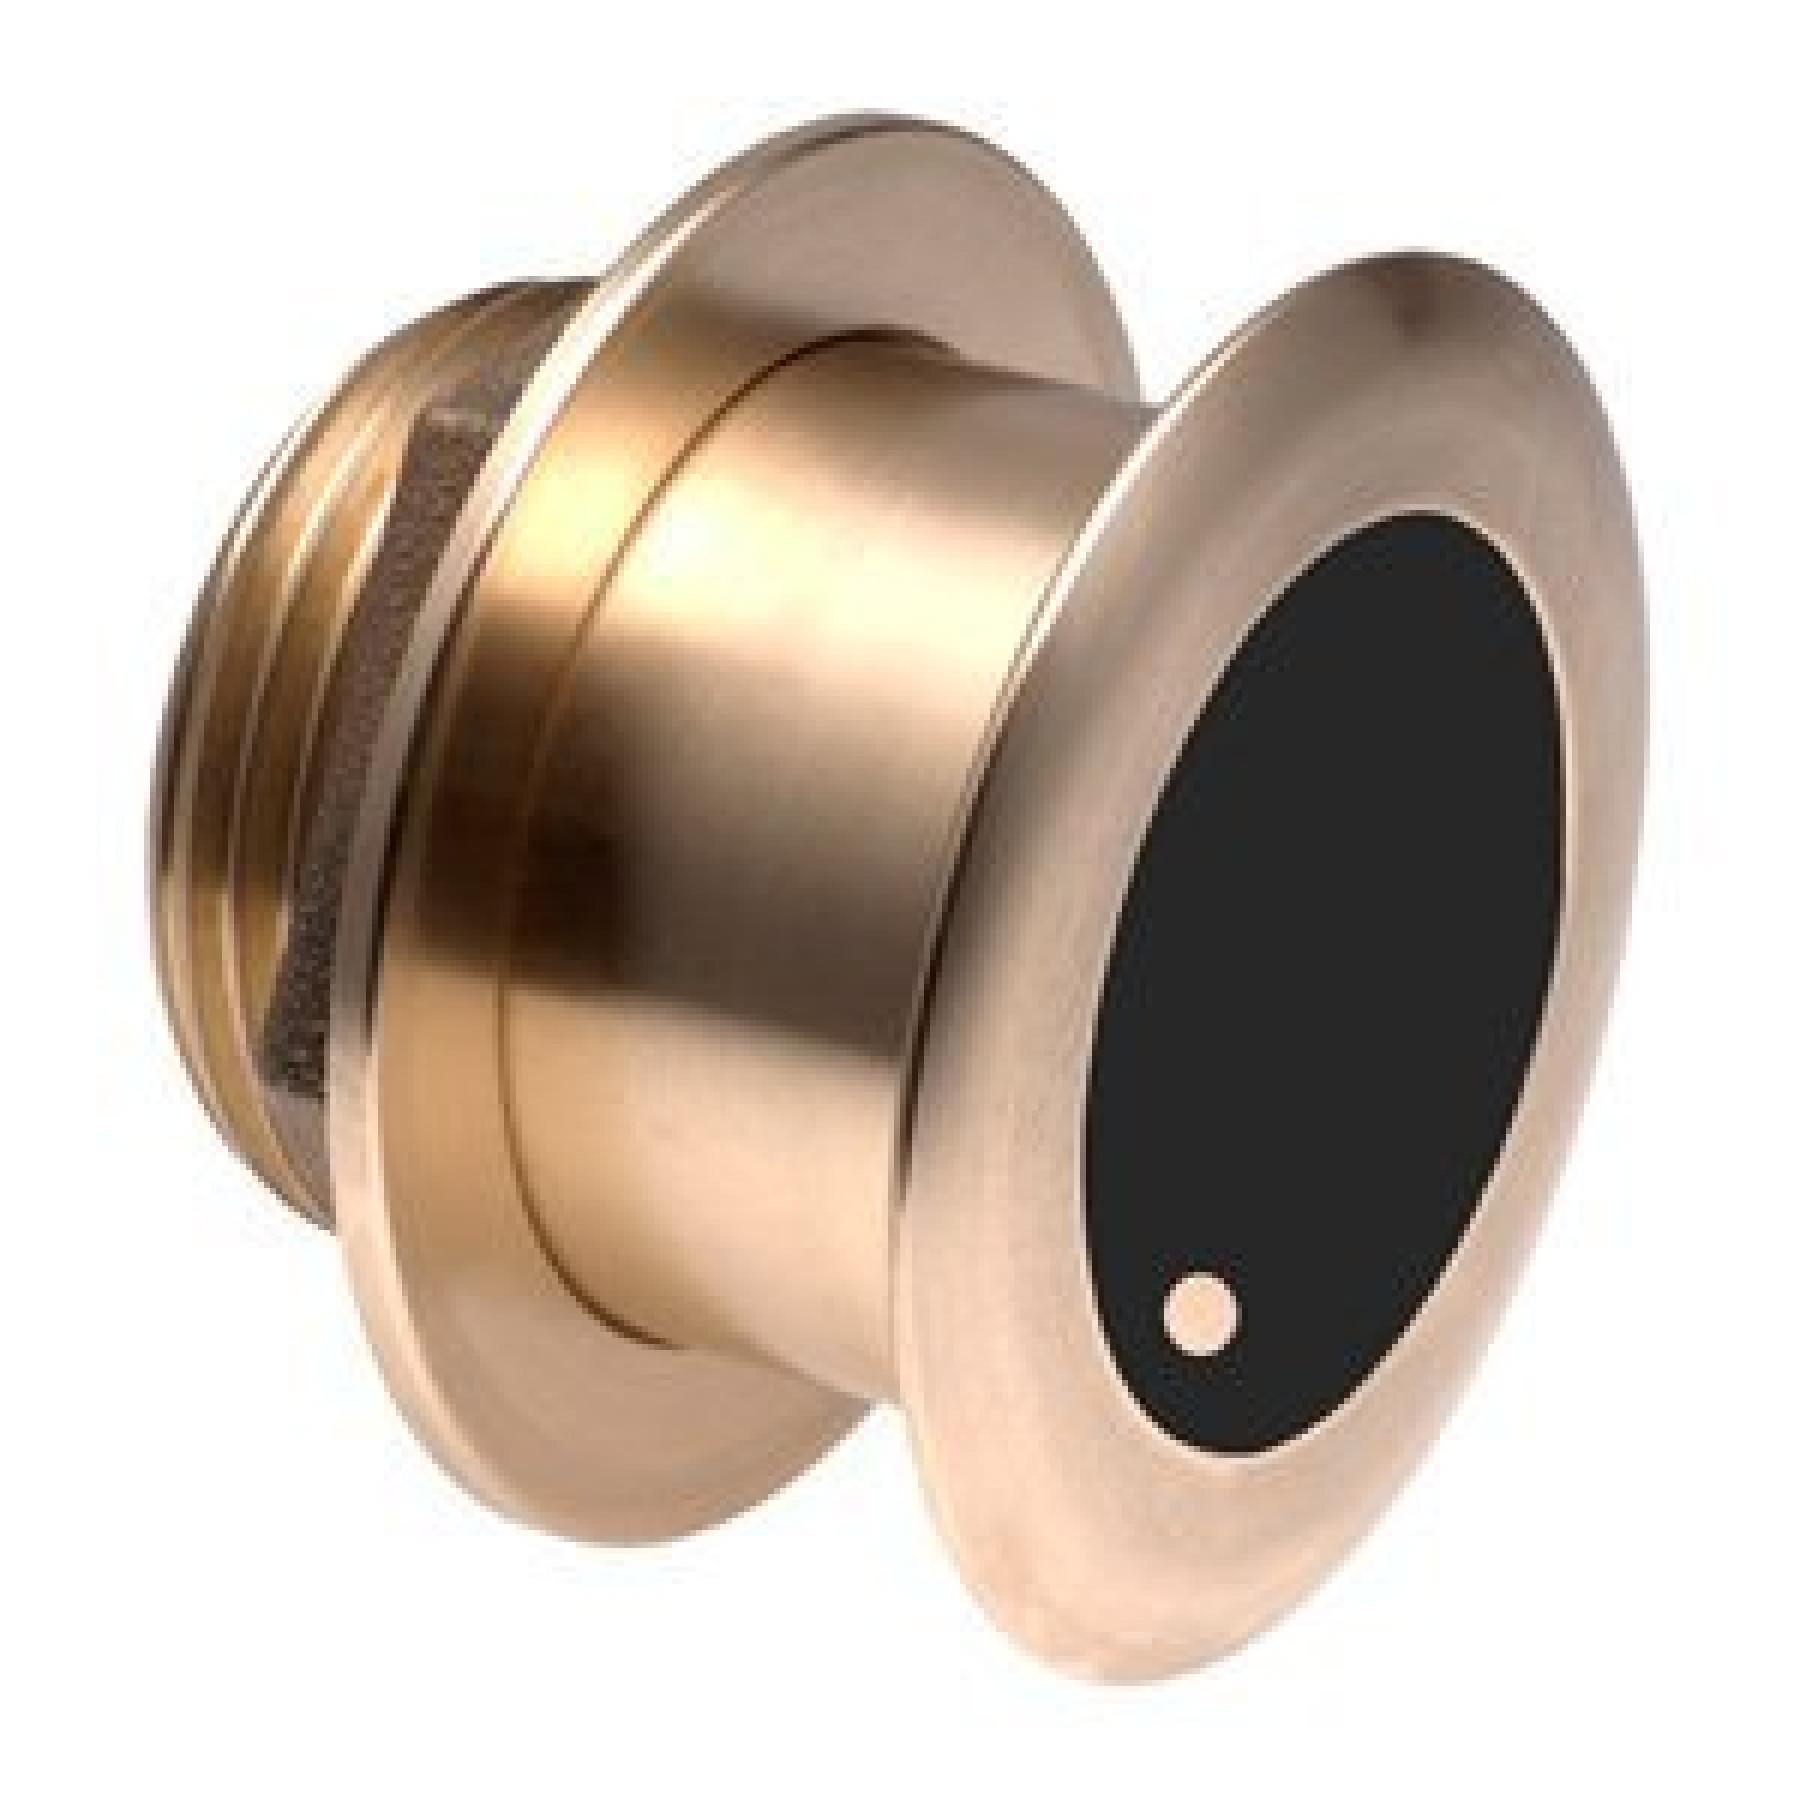 Garmin airmar b175l sensor with 20° inclination